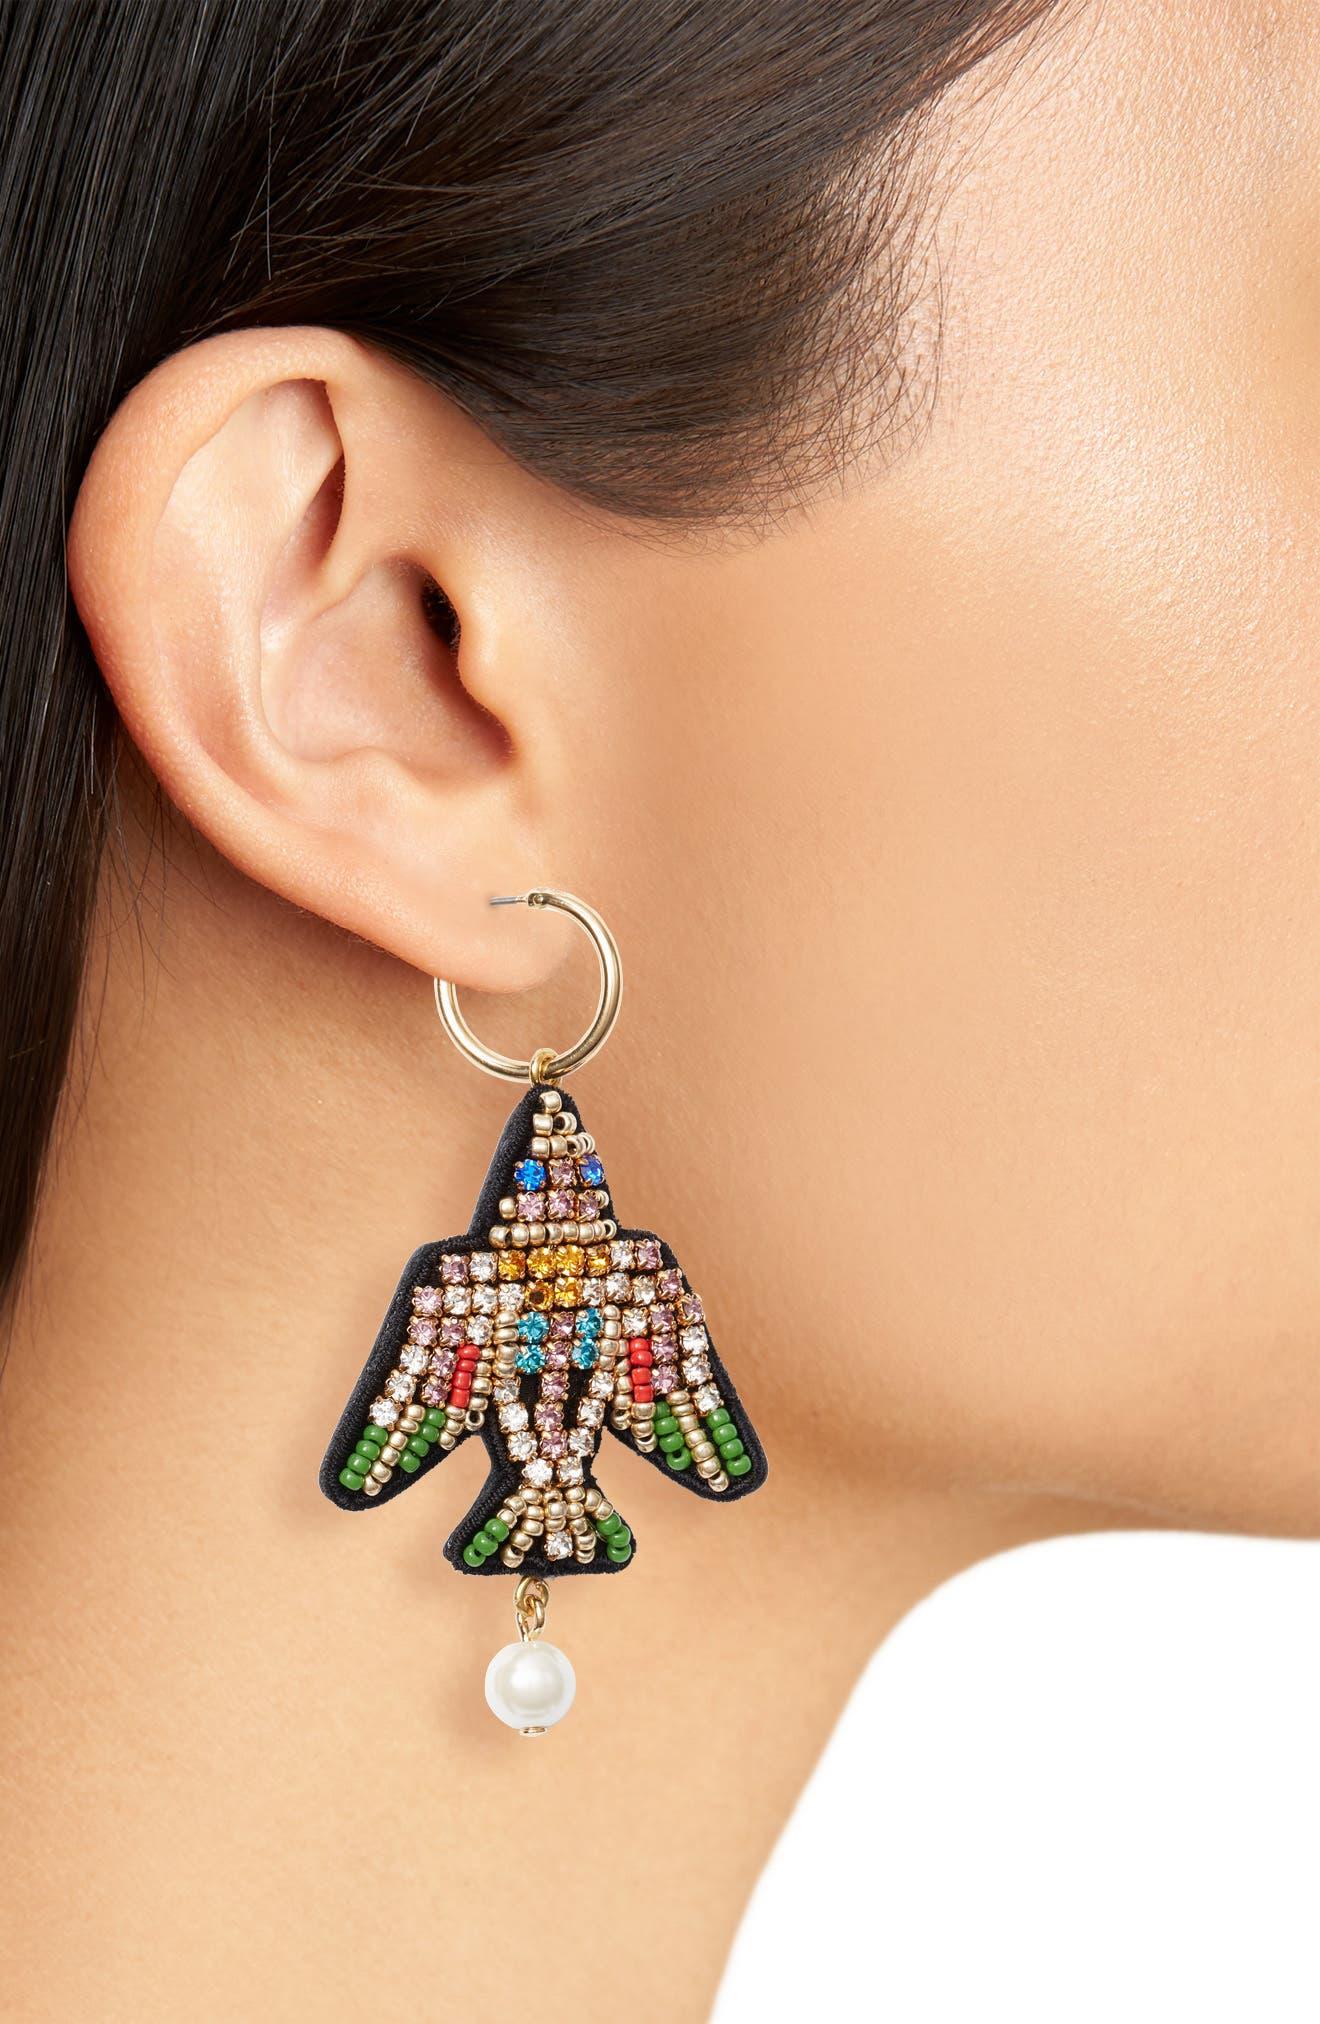 Leather-Backed Beaded Bird Earrings,                             Alternate thumbnail 2, color,                             GREEN MULTI